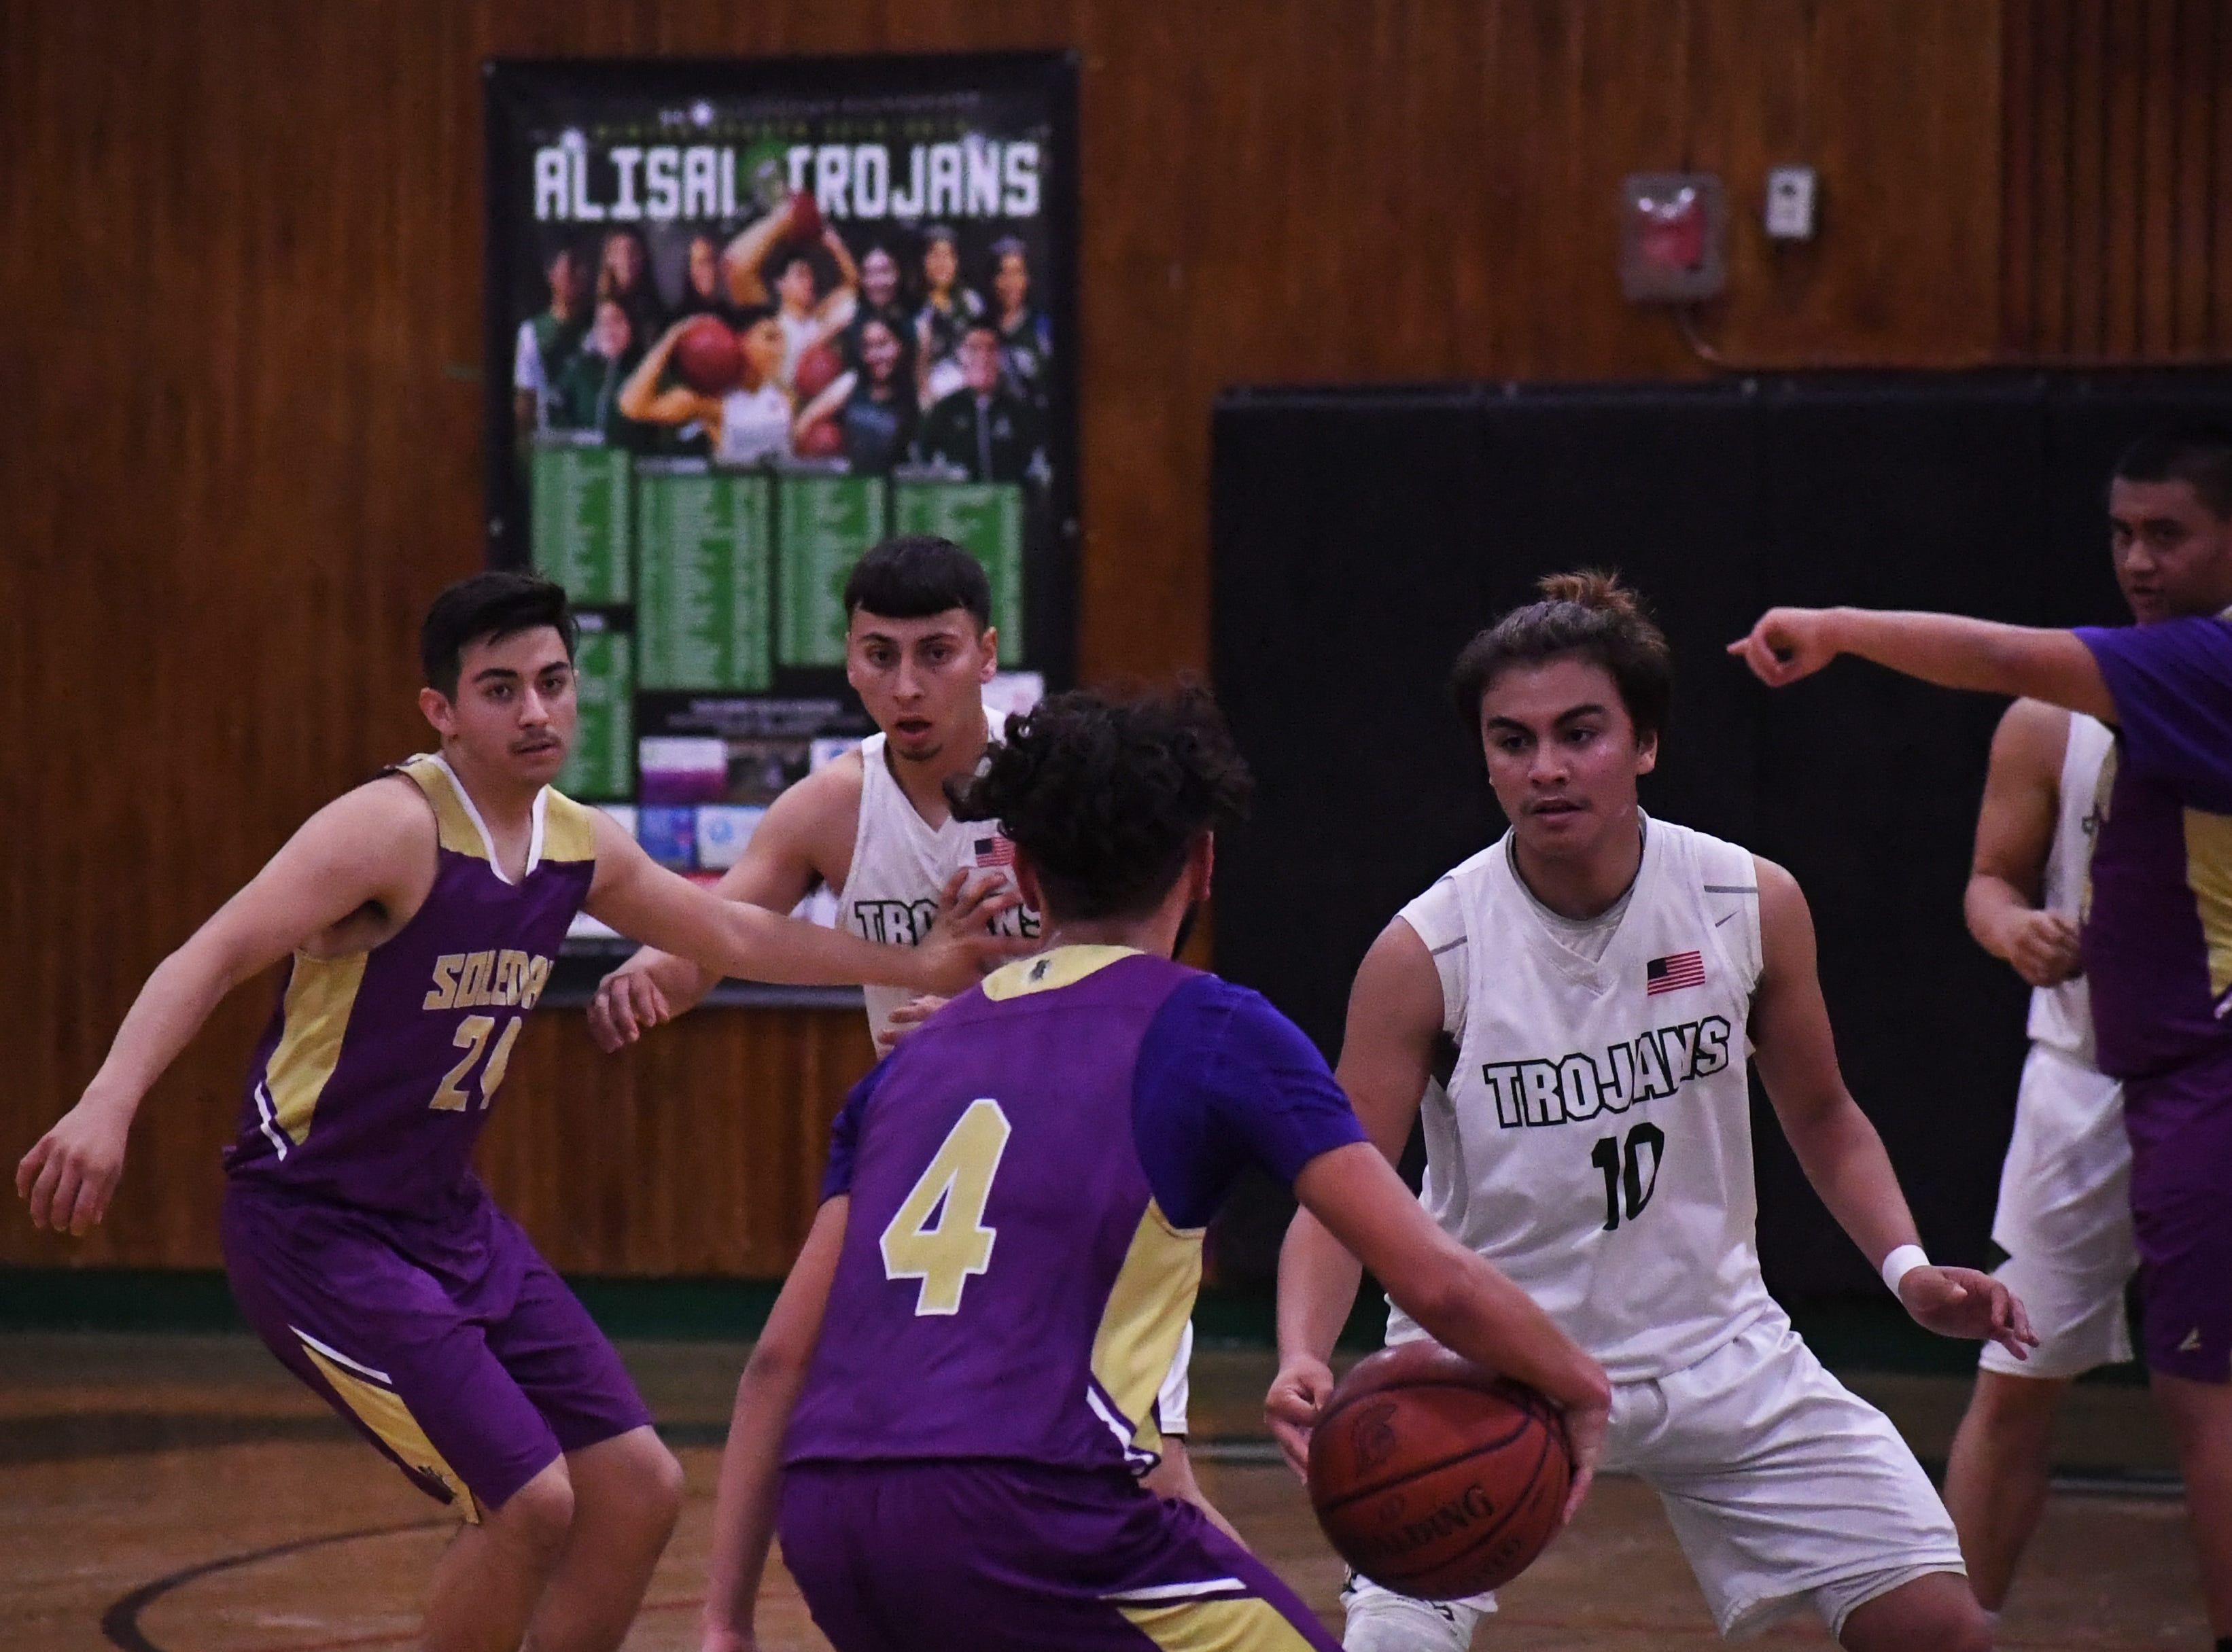 Guard Vincent Gonzalez (10) tracks his man on defense.